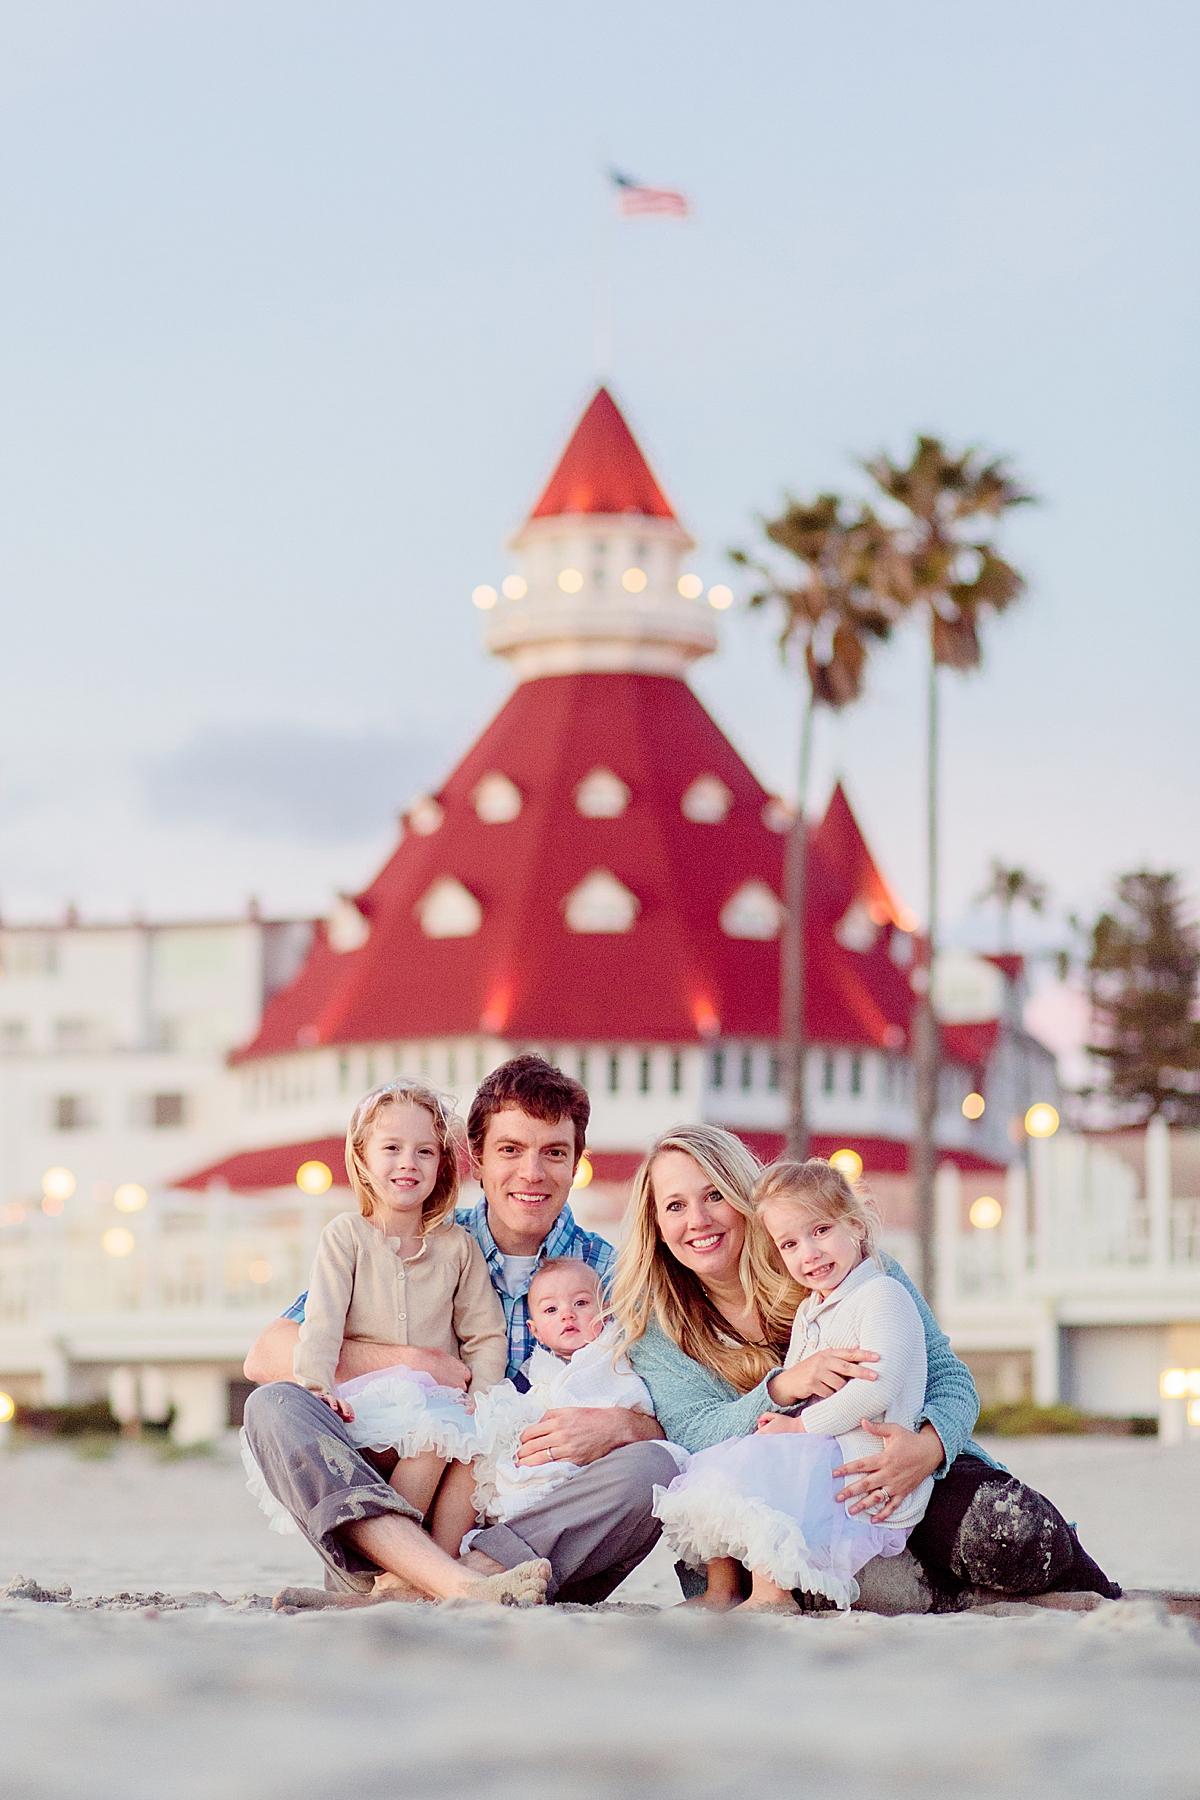 San Diego Photographer | Hotel del Coronado Photographer